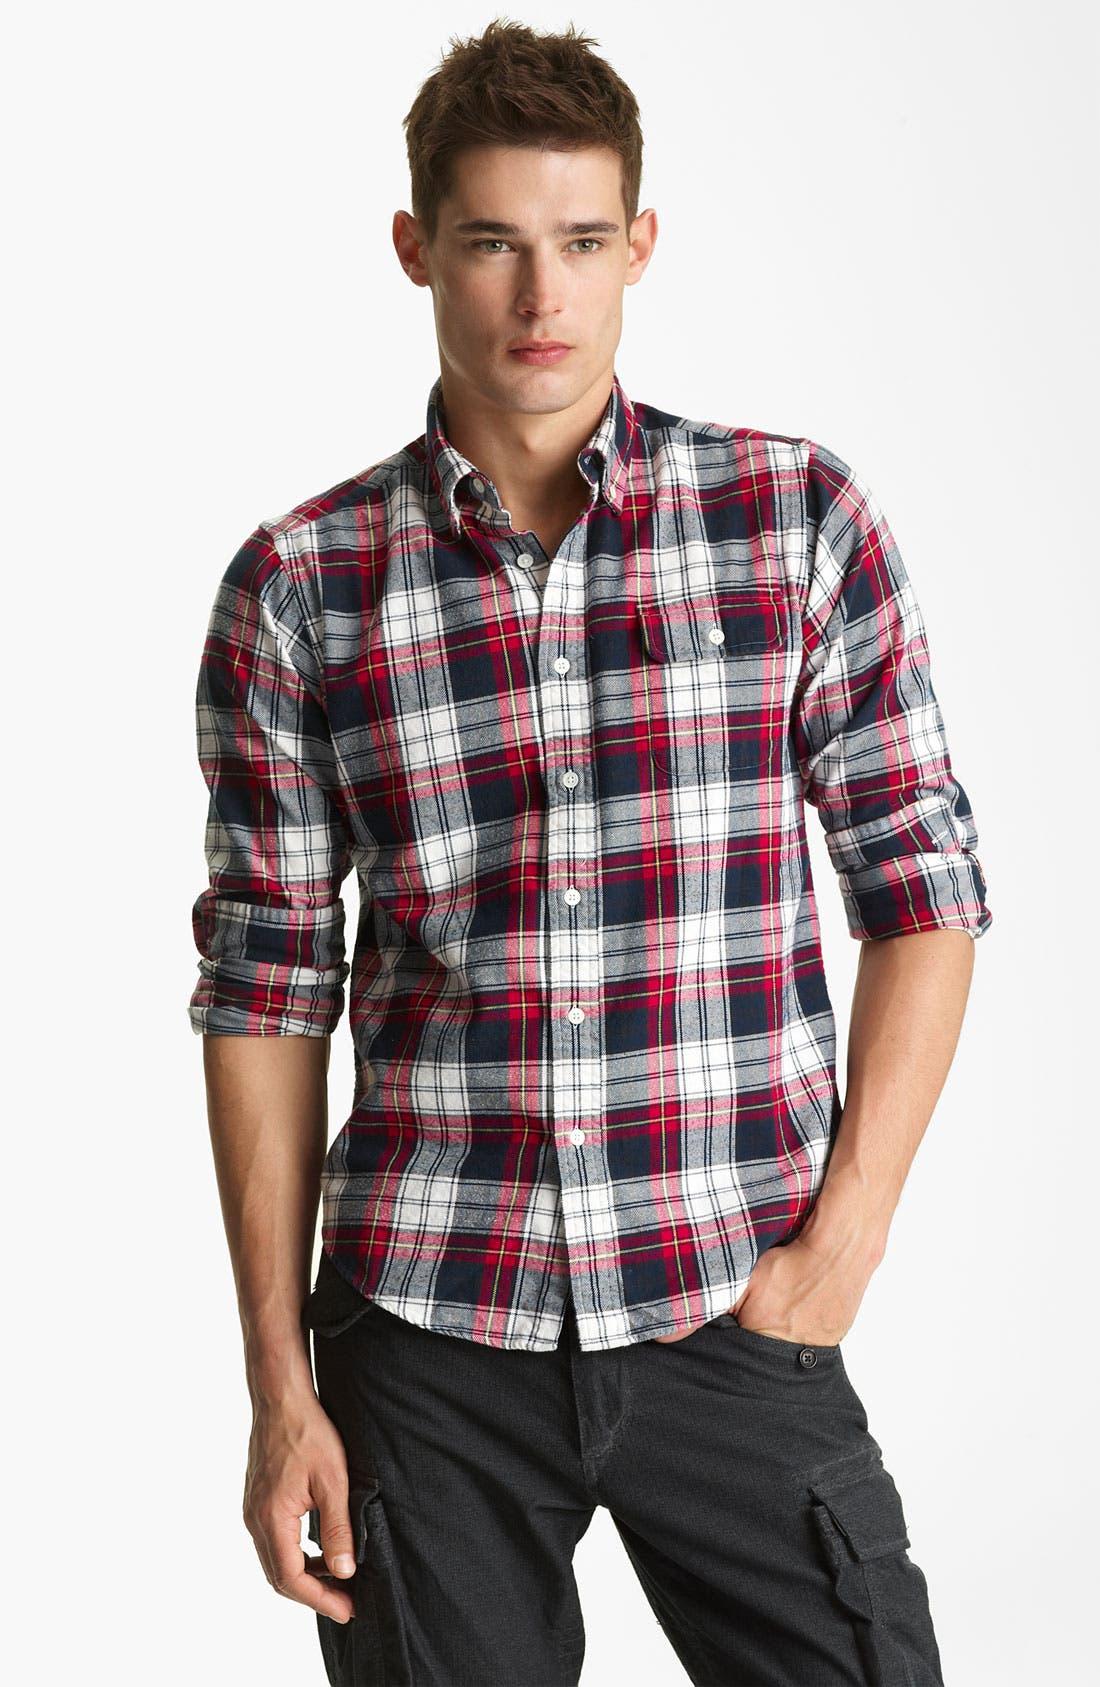 Main Image - Gant by Michael Bastian Cotton Flannel Shirt